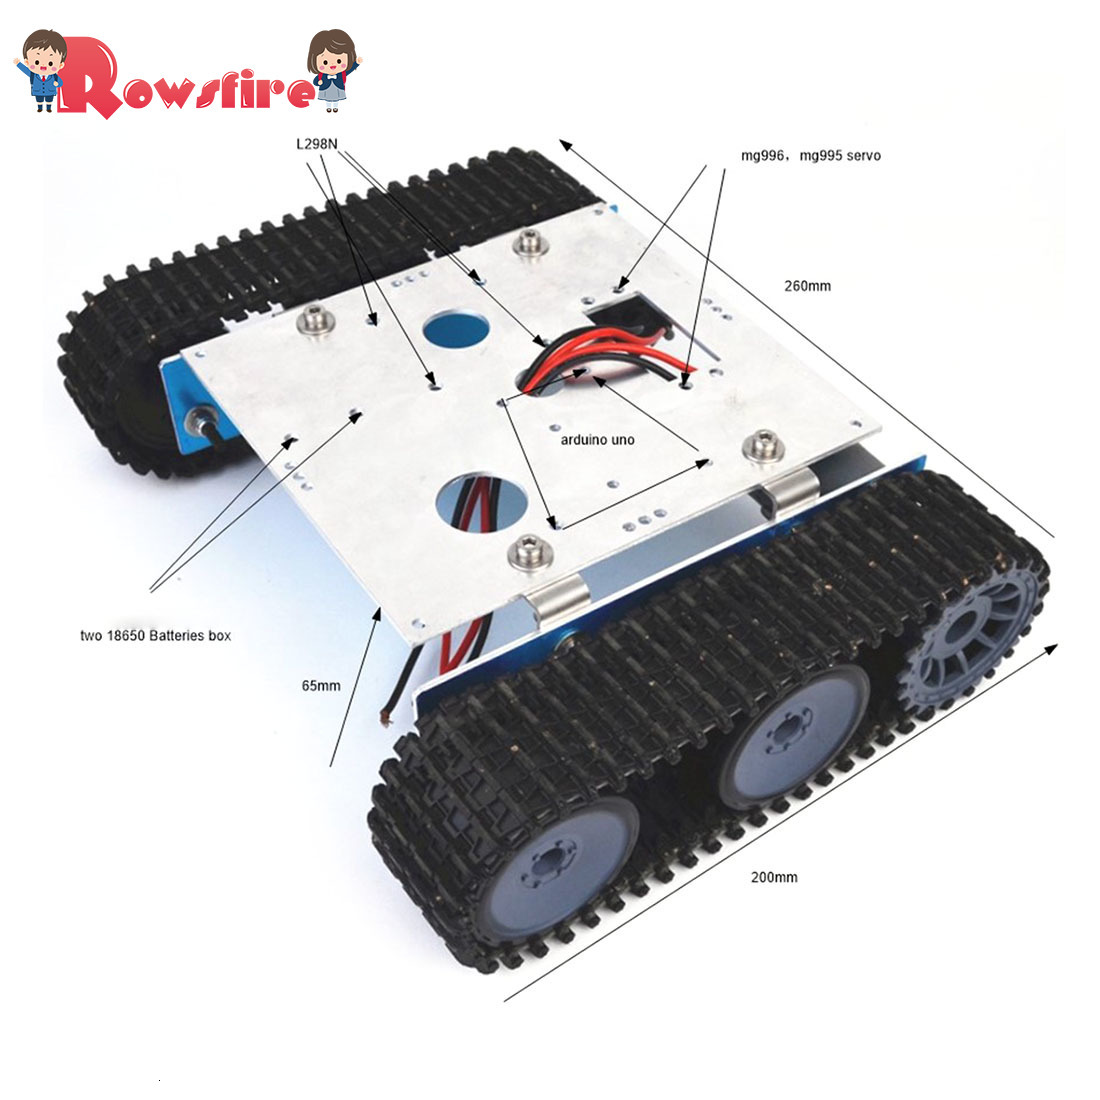 Damping Balance Tank Robot Chassis Platform Remote Control DIY For Arduino Q